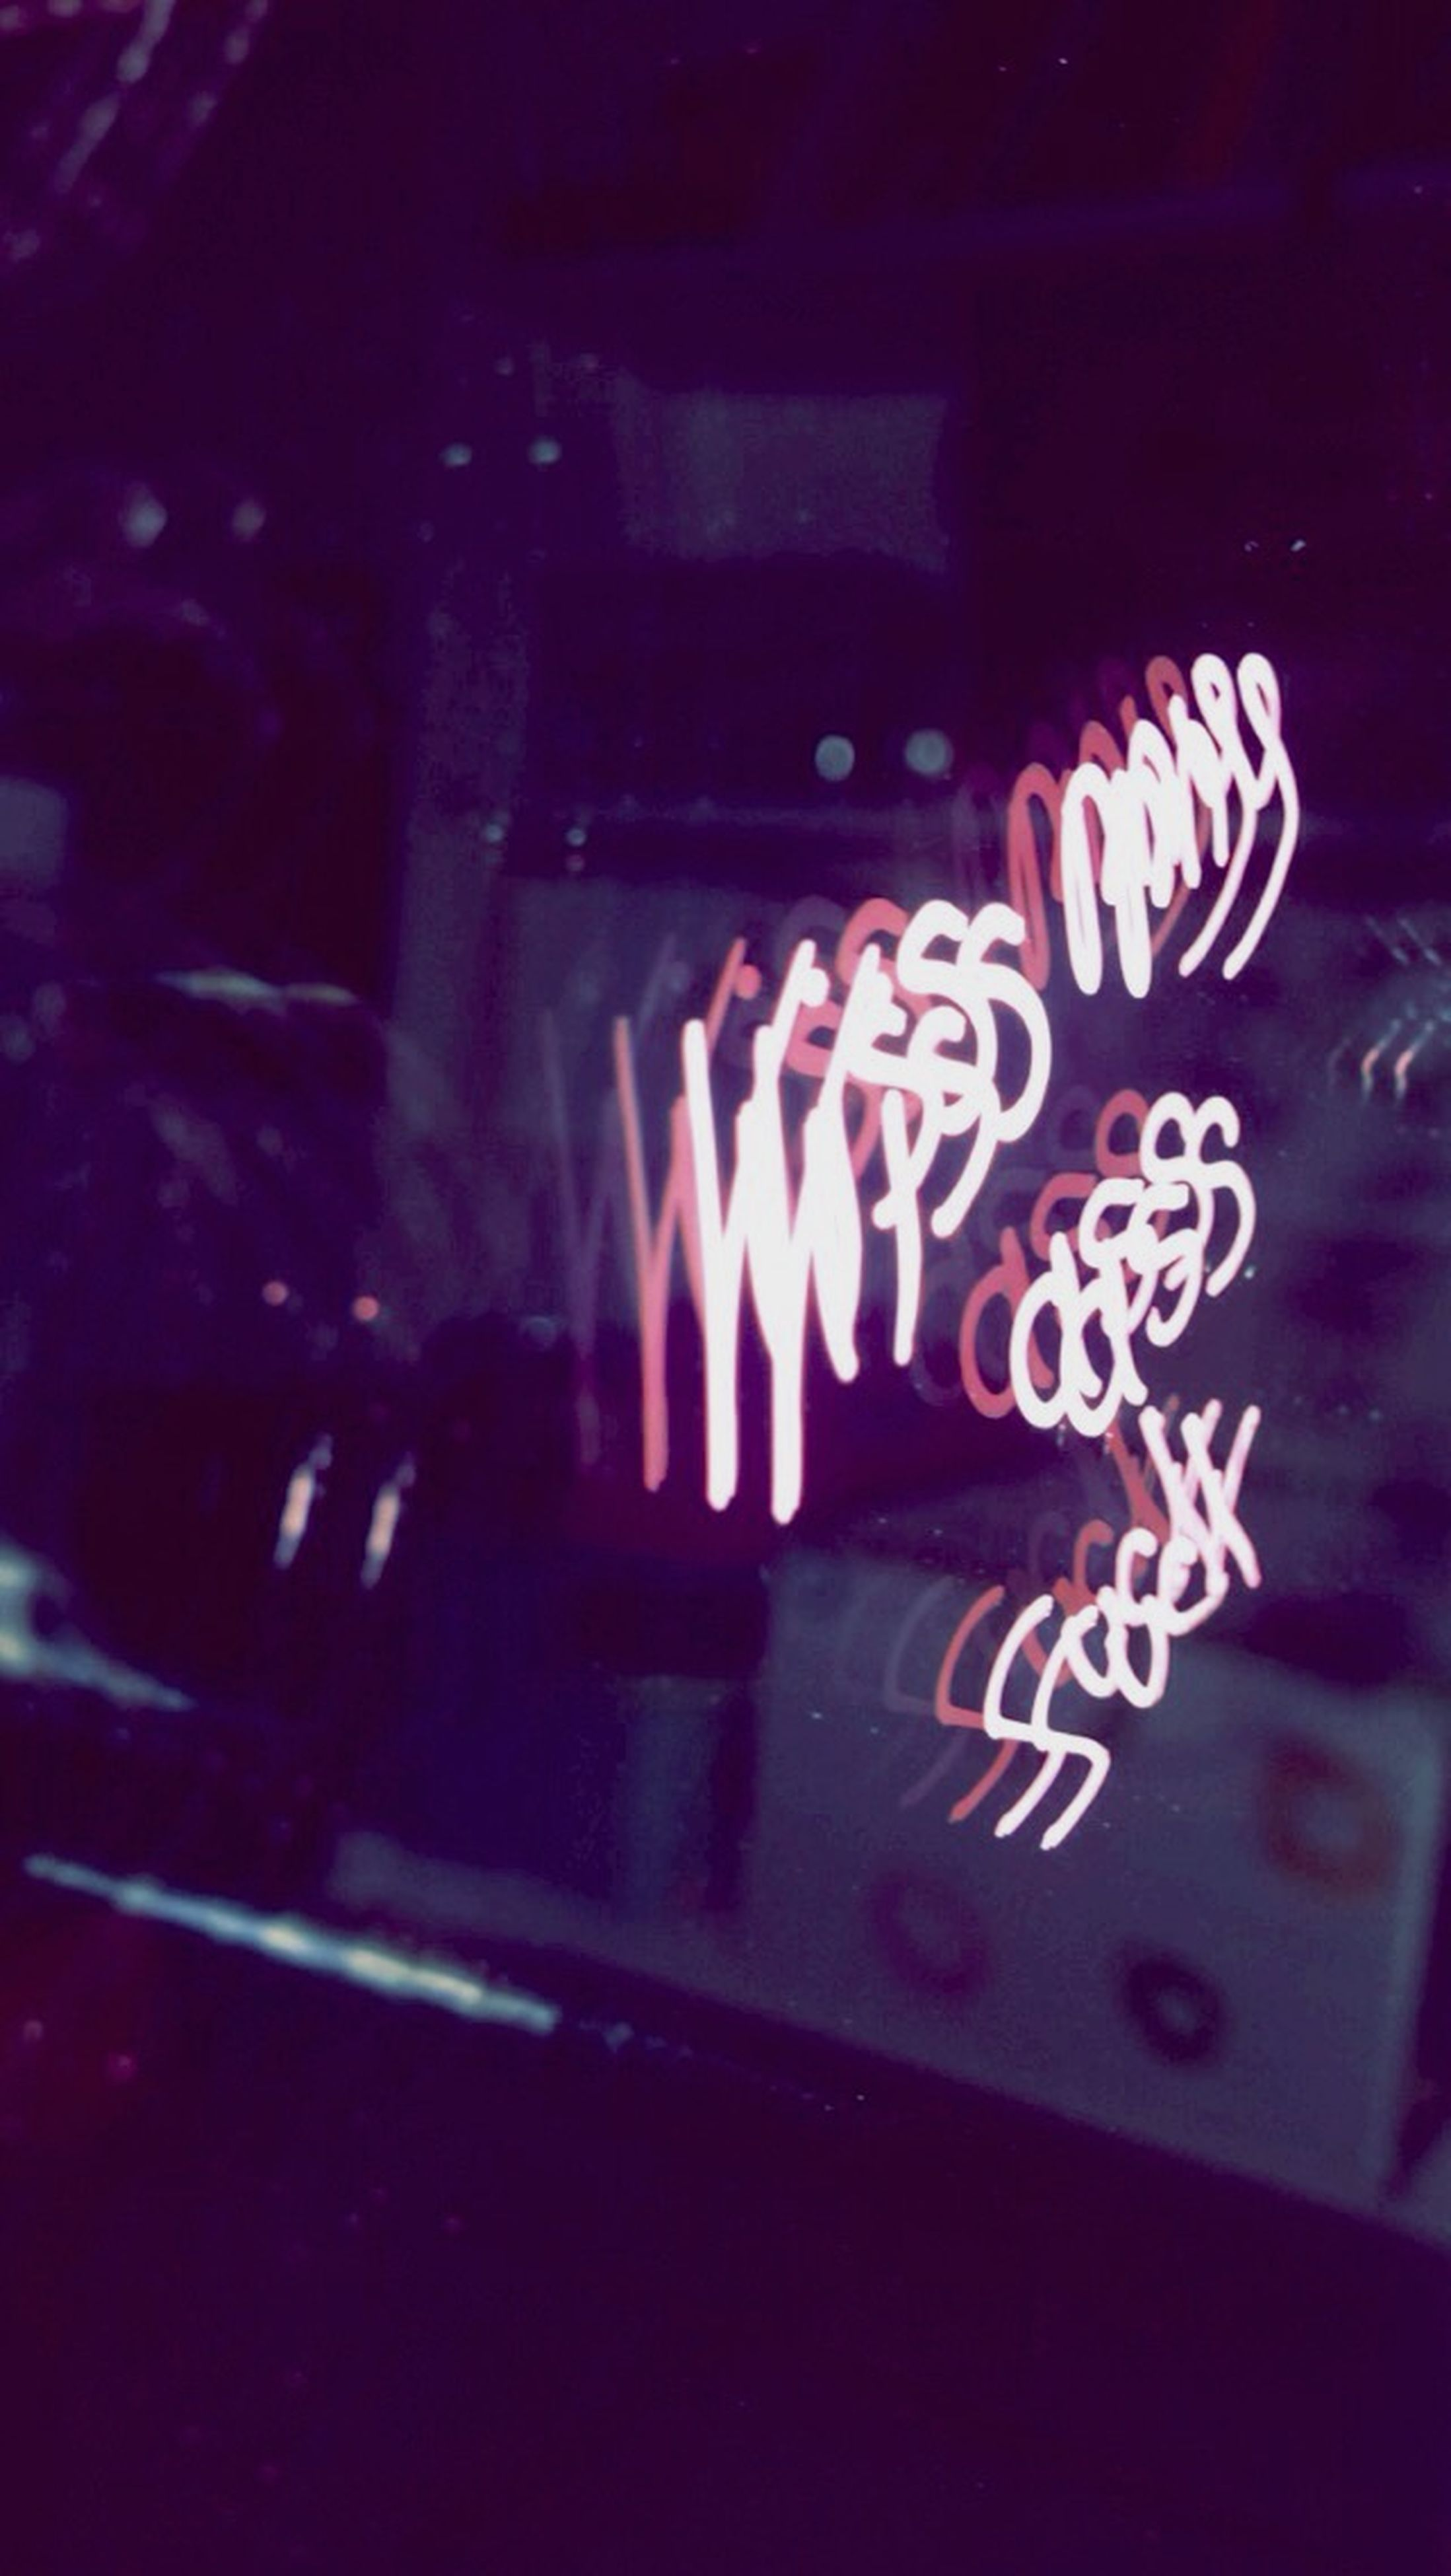 indoors, illuminated, night, flame, burning, arts culture and entertainment, fire - natural phenomenon, glowing, art and craft, celebration, close-up, heat - temperature, light - natural phenomenon, art, creativity, candle, multi colored, motion, dark